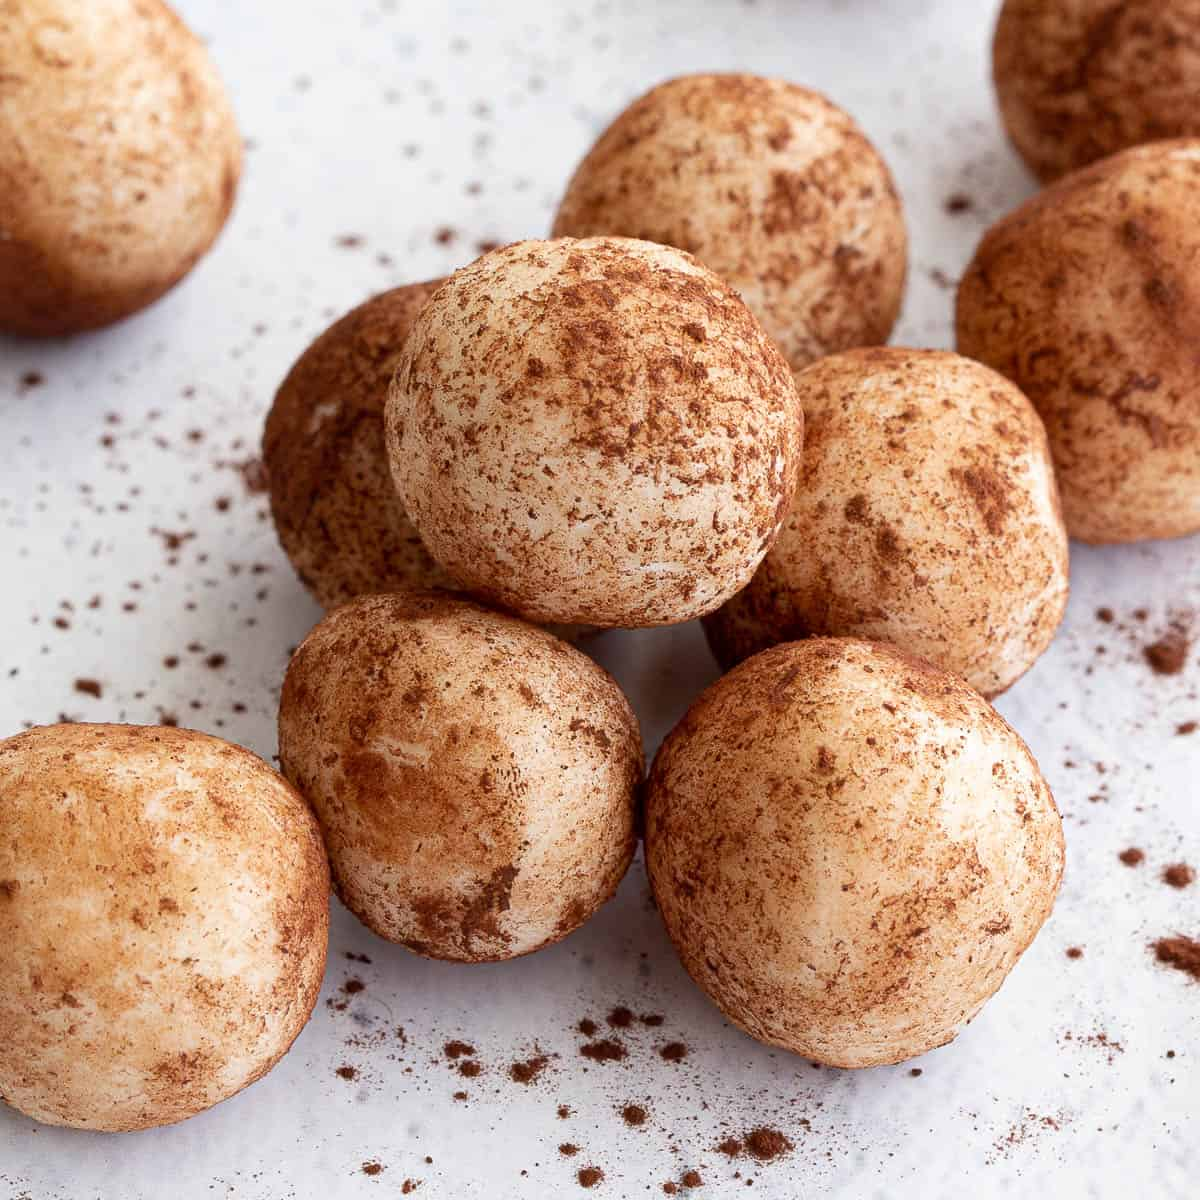 Cocoa coconut balls on a white background.